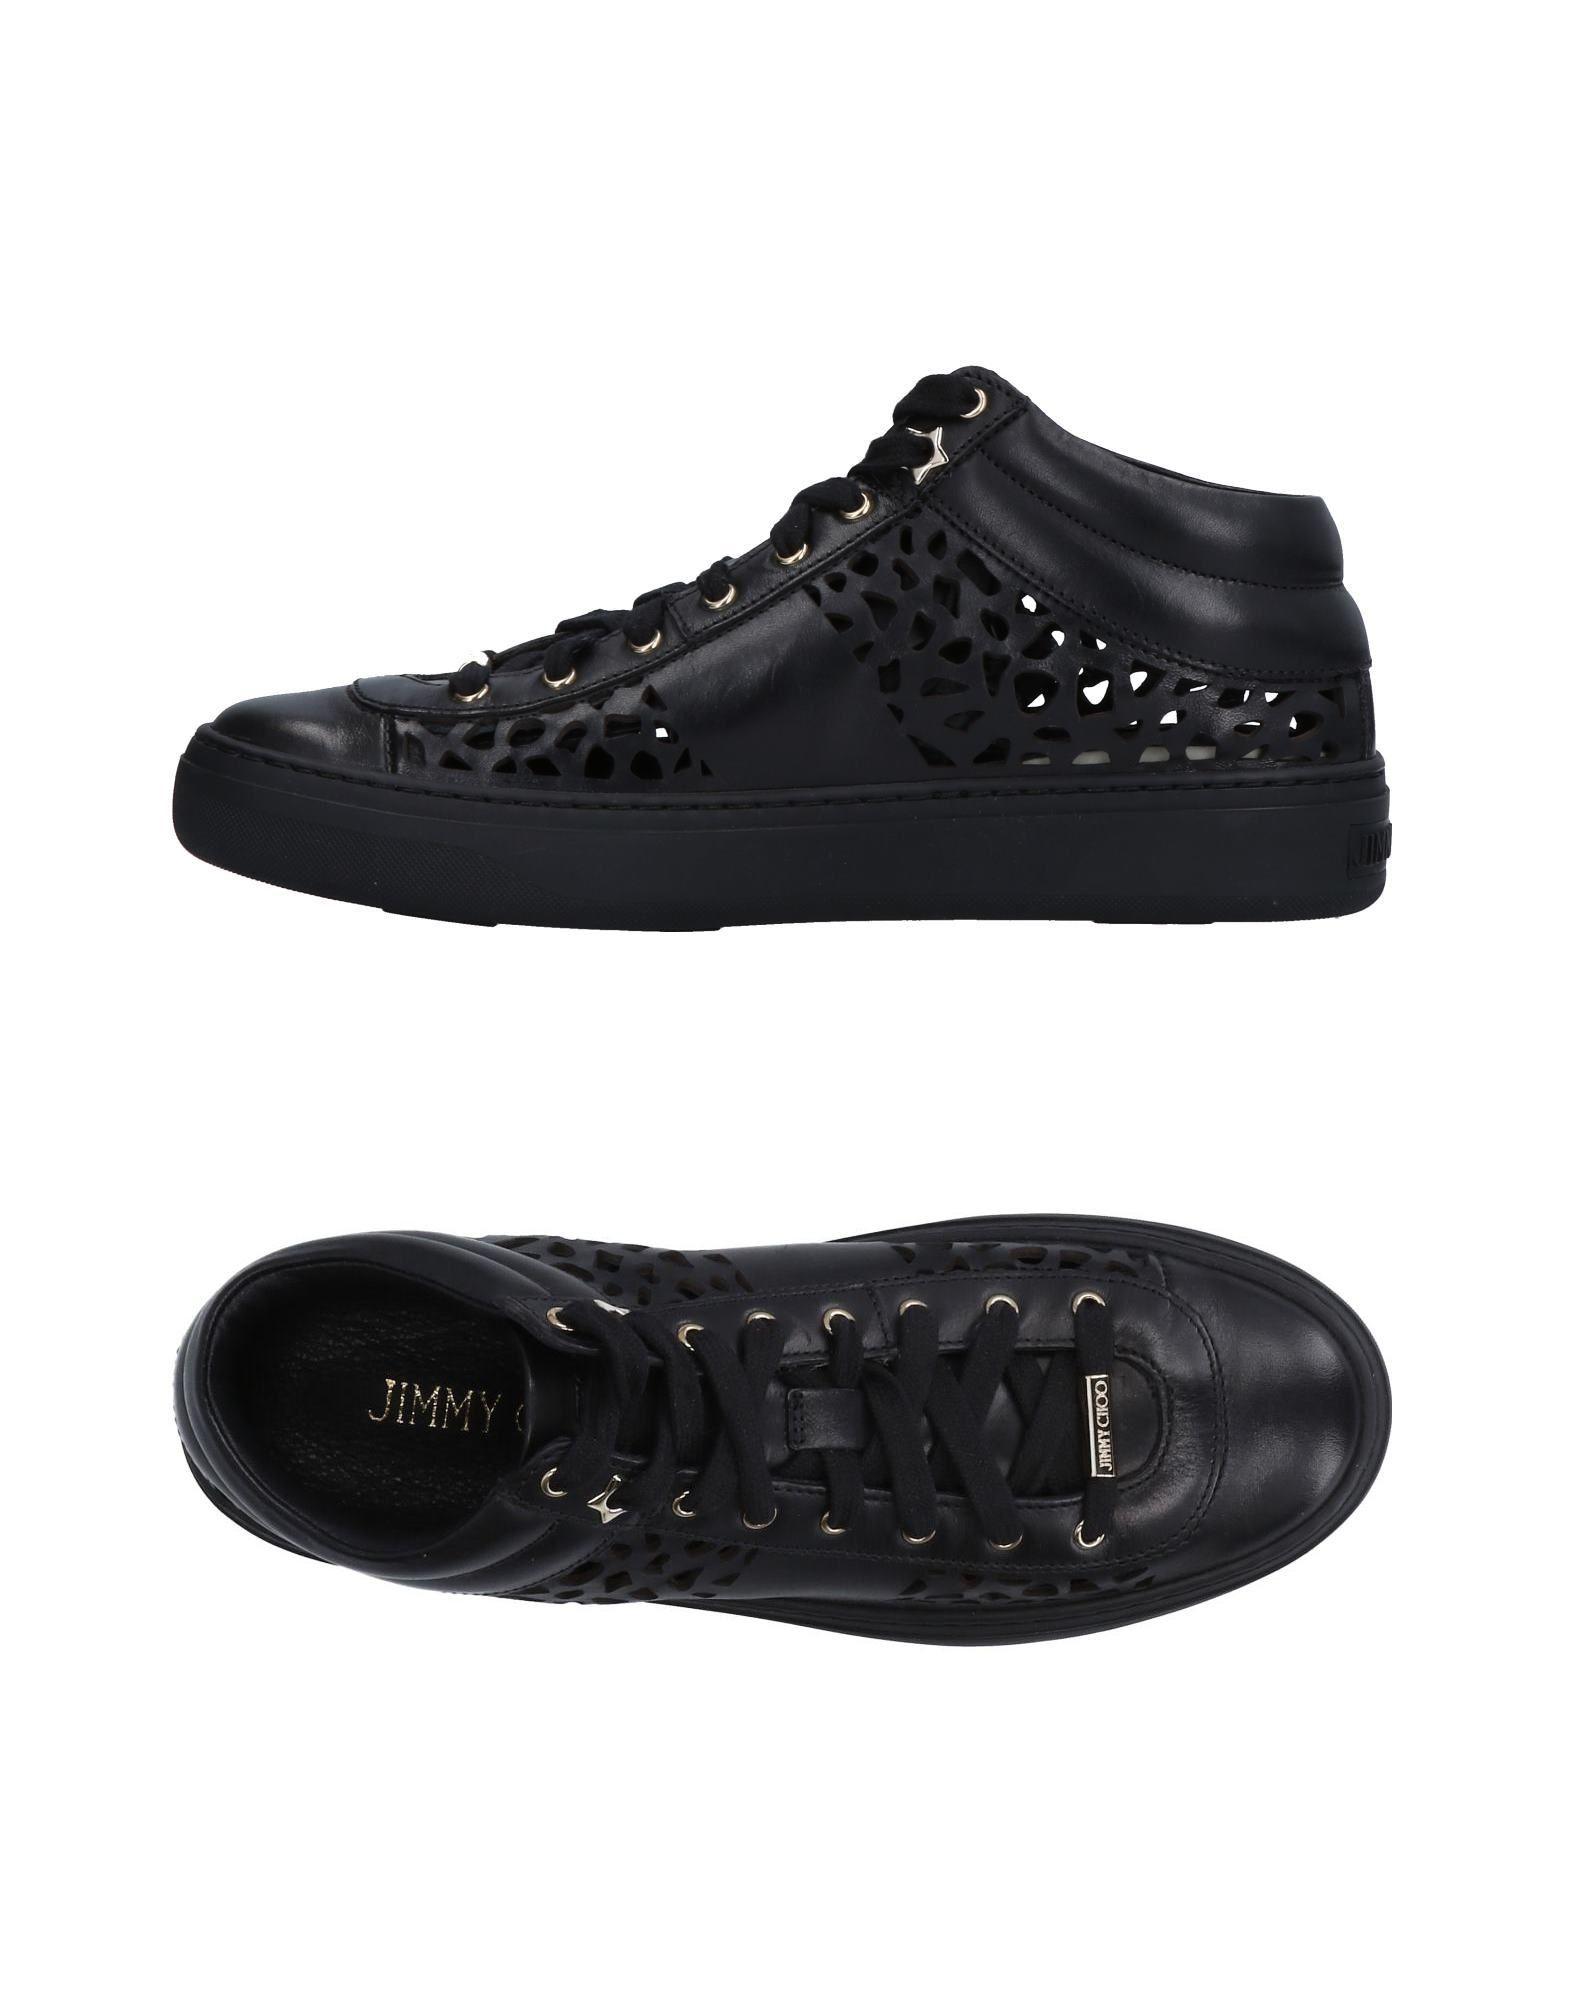 Jimmy Choo Sneakers Damen  11510234UQGünstige gut aussehende Schuhe